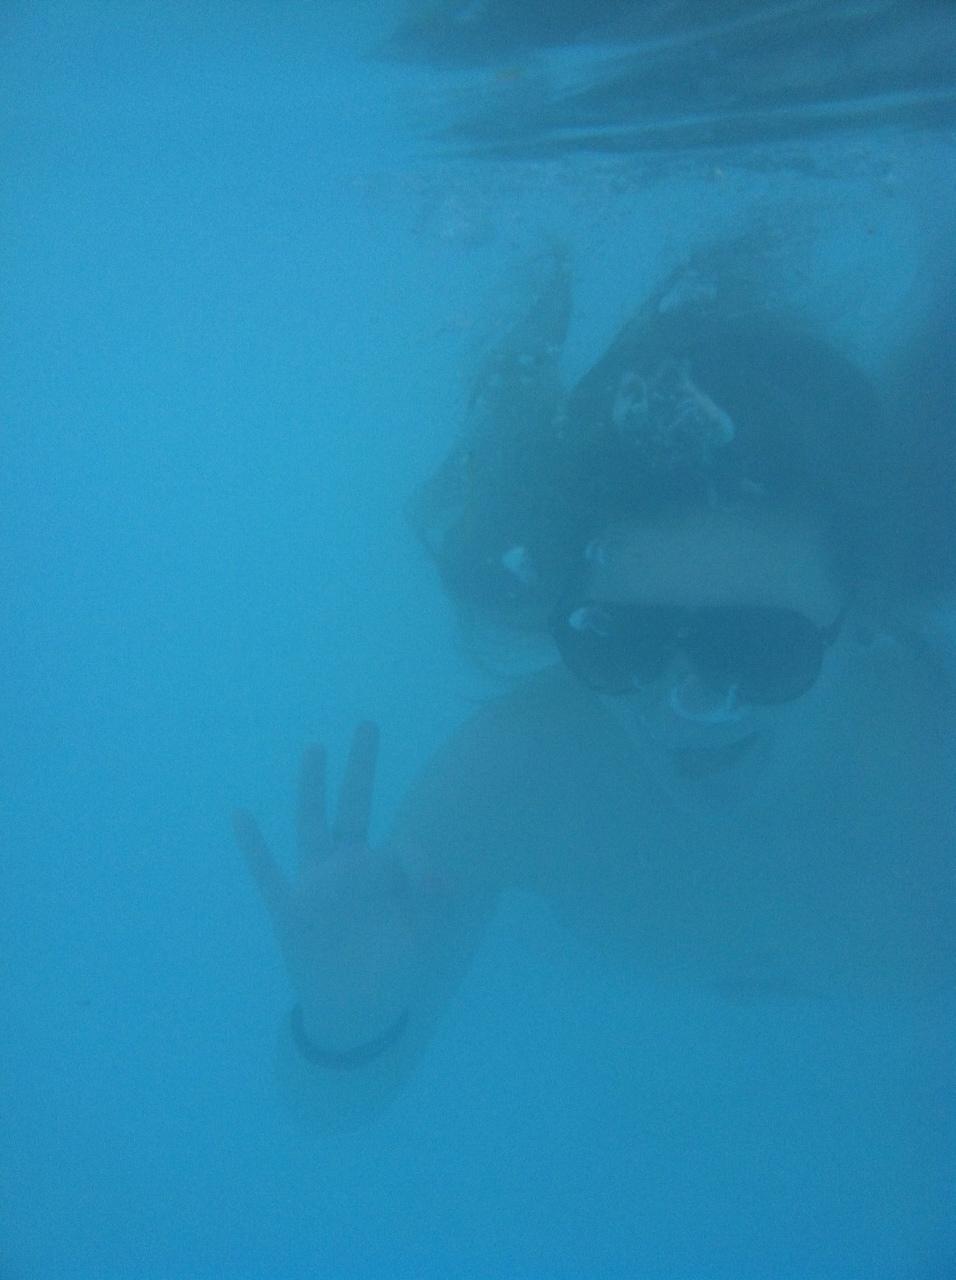 Who needs sun glasses underwater??